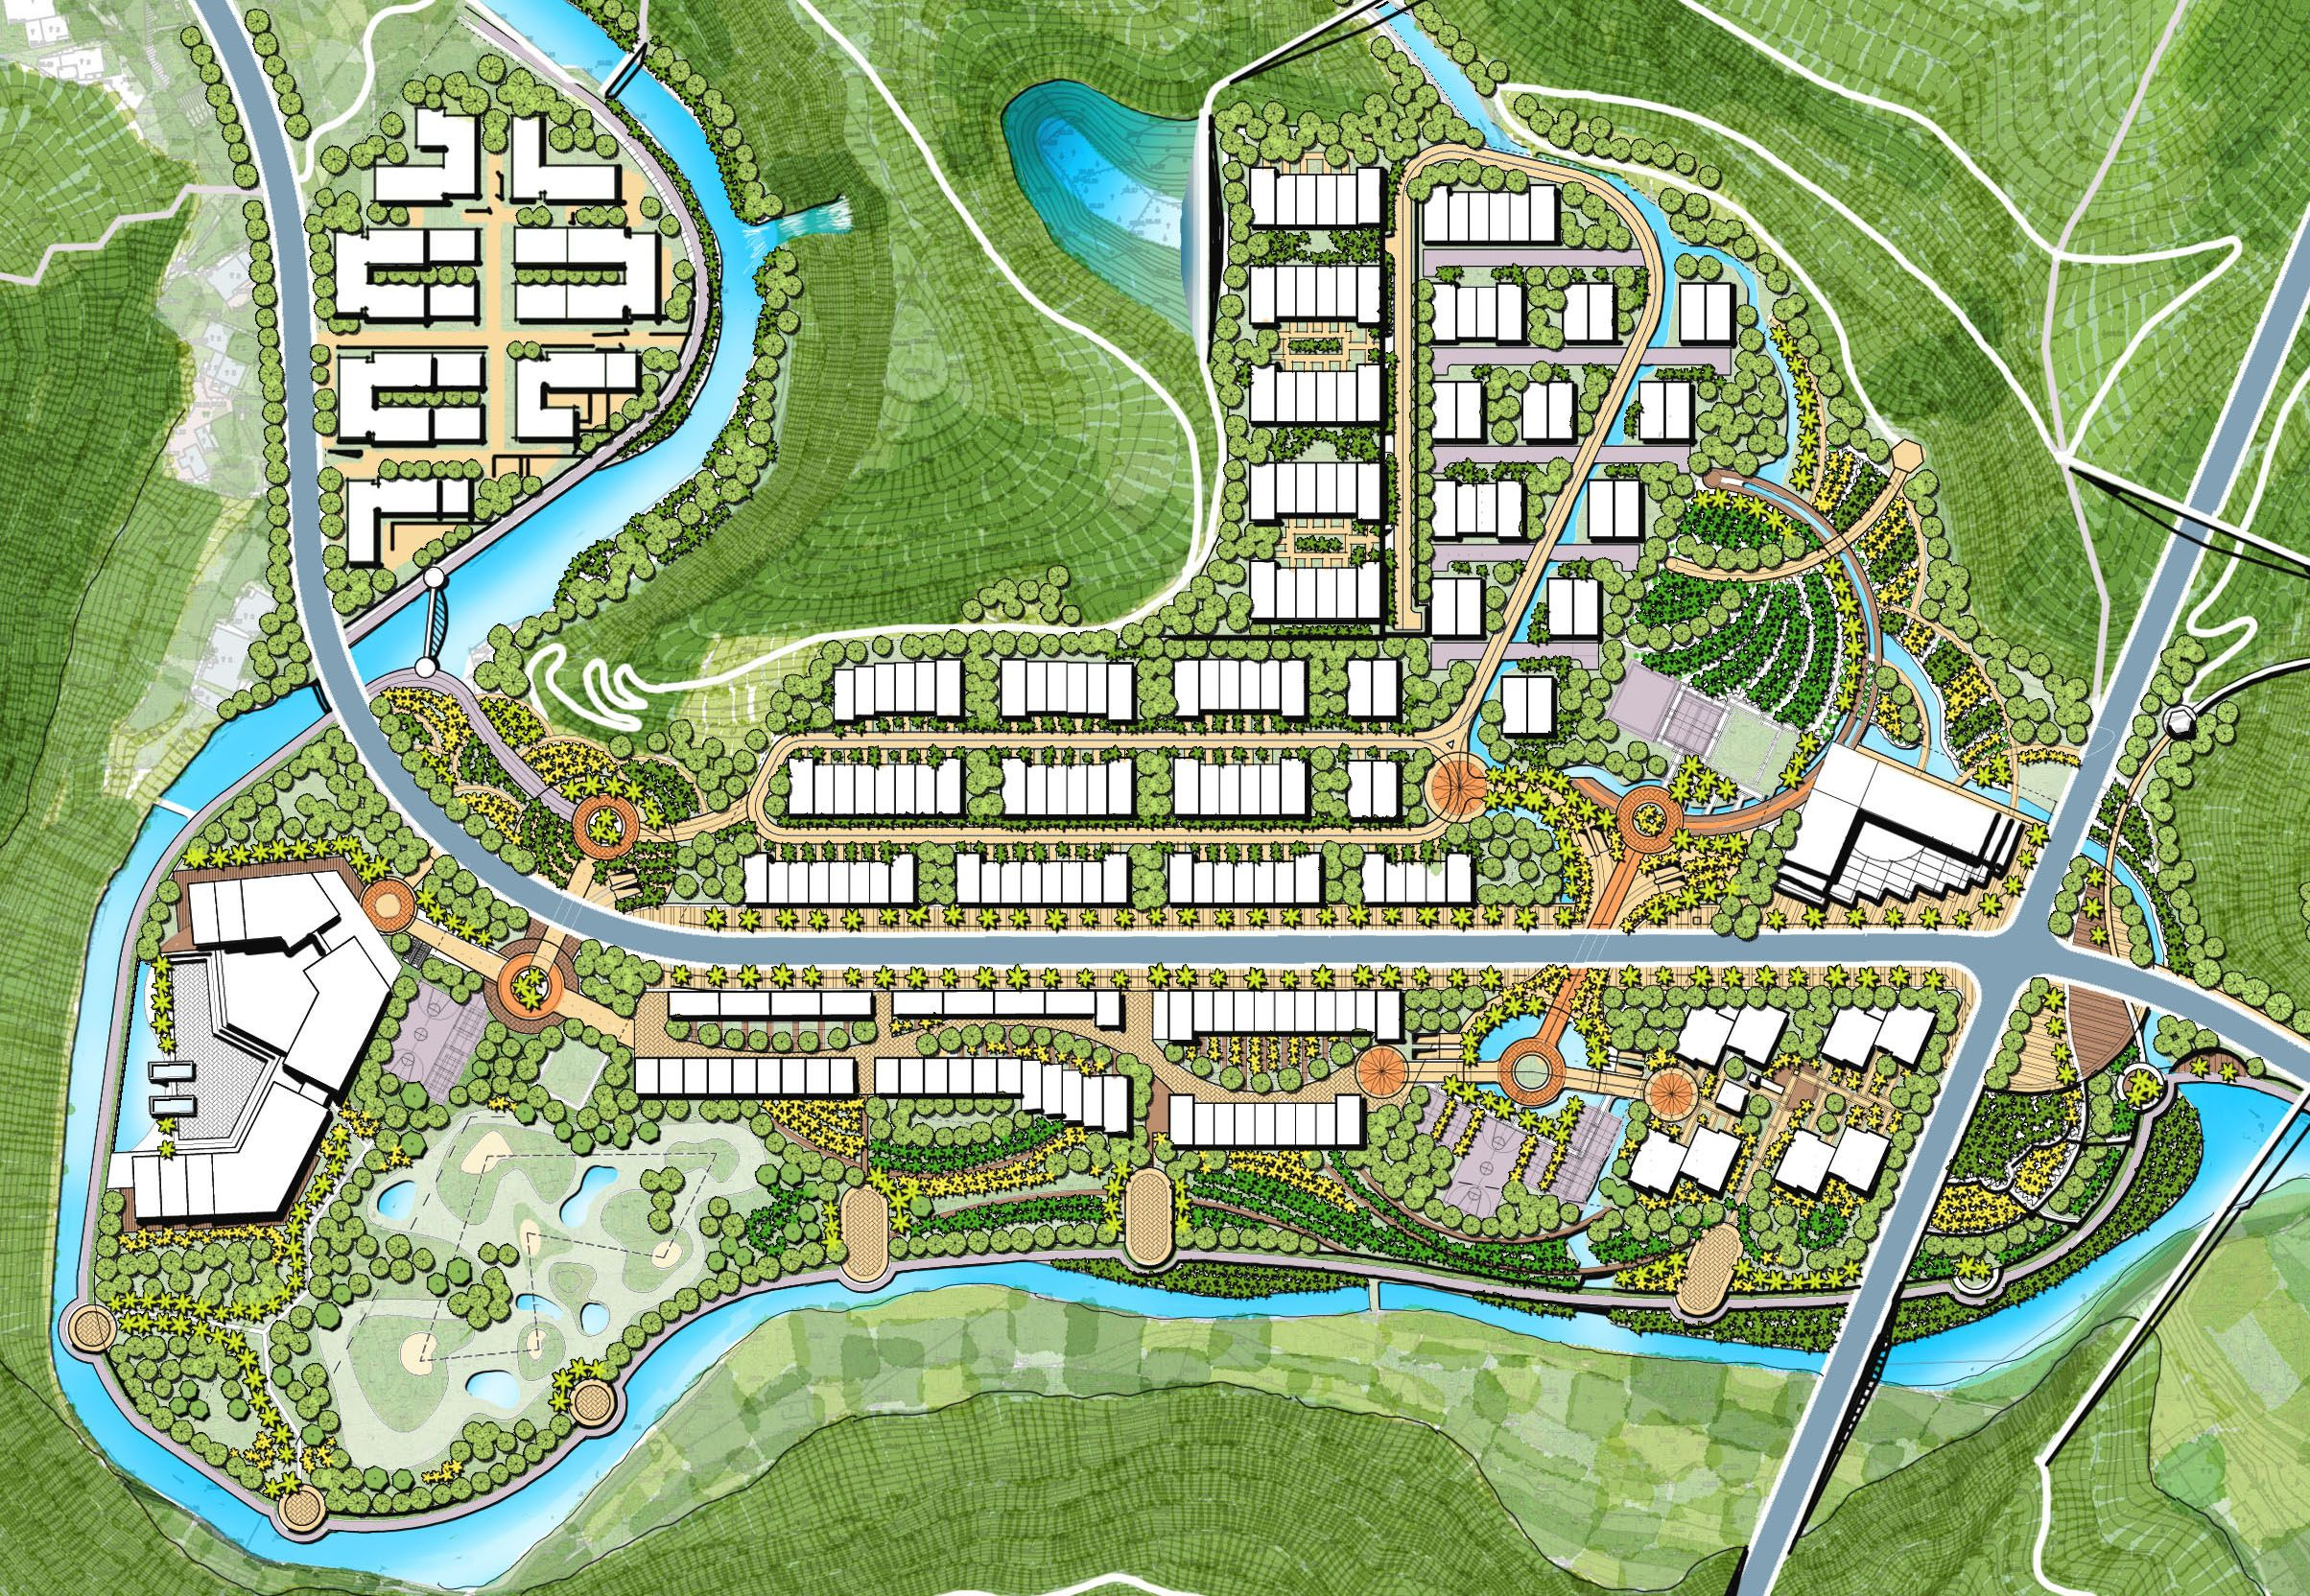 Row Housing Development And Landscape River Side Development Residential Landscape Private Gardens In 2020 Urban Design Graphics Urban Planning Master Plan